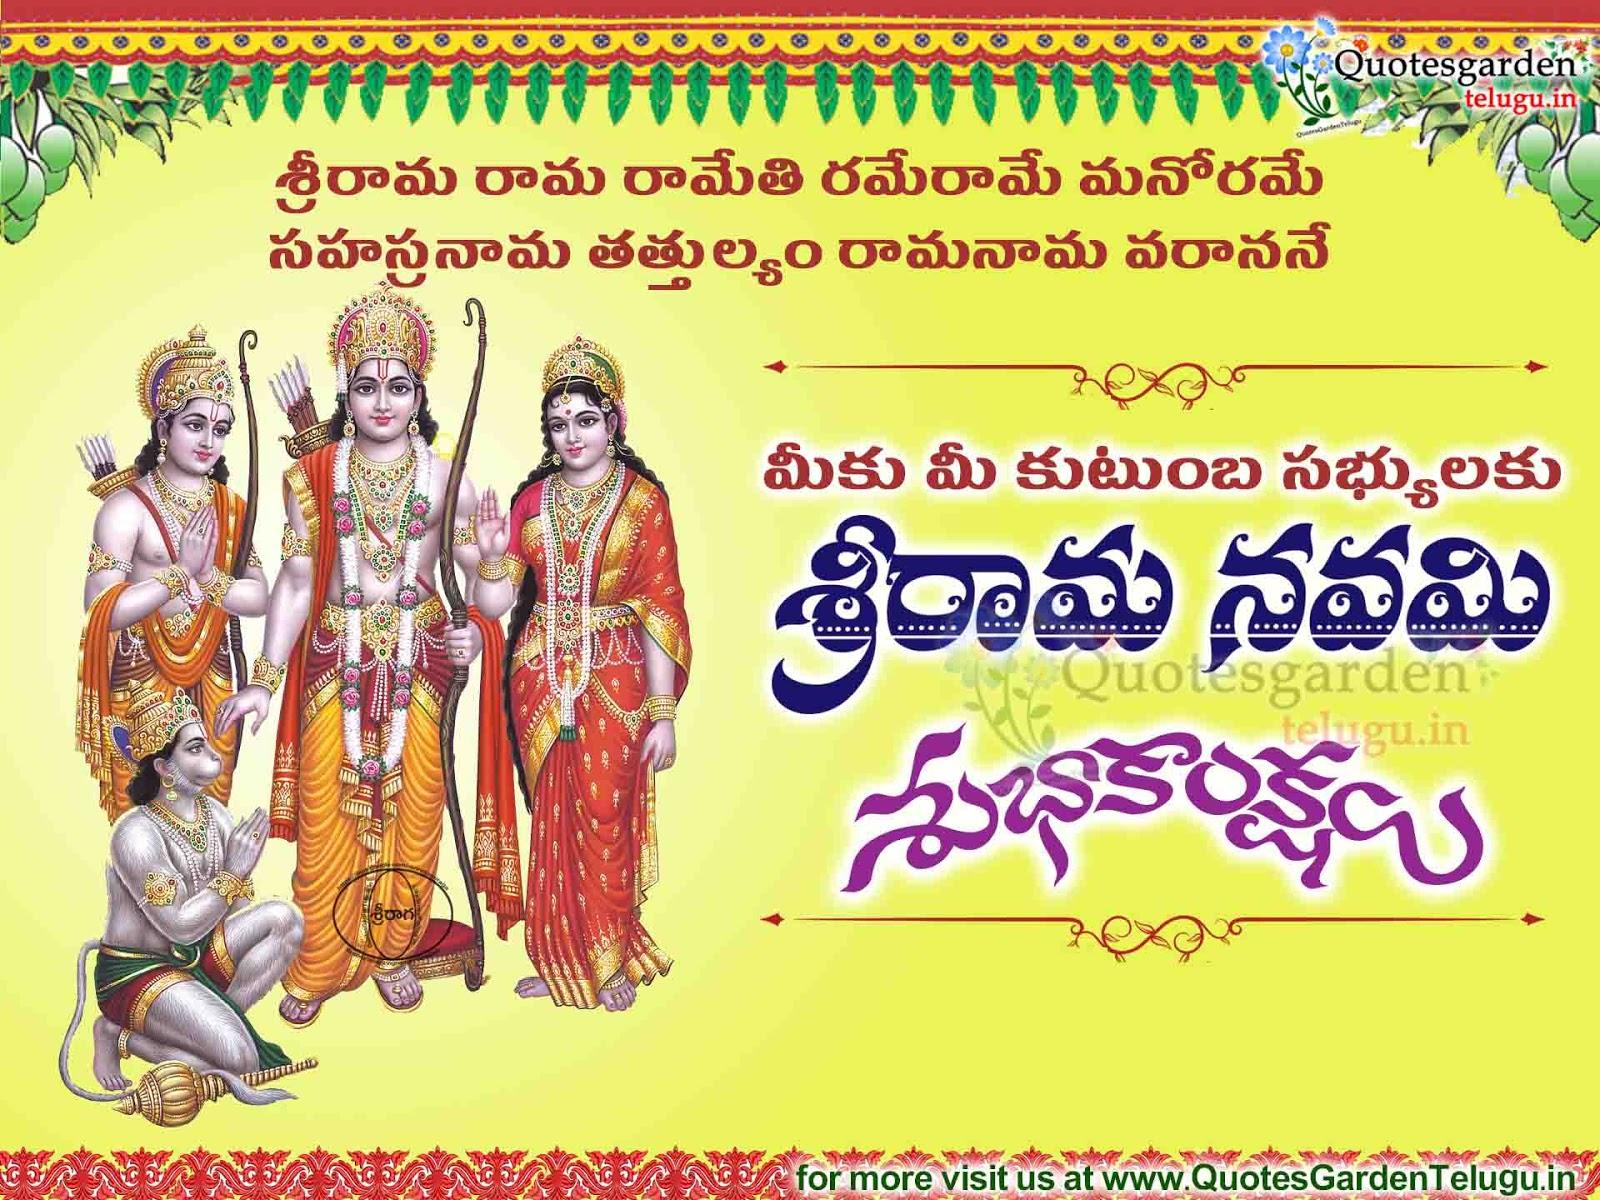 Sri rama navami 2017 photo labzada wallpaper sri rama navami 2017 greetings quotes wishes messages quotes m4hsunfo